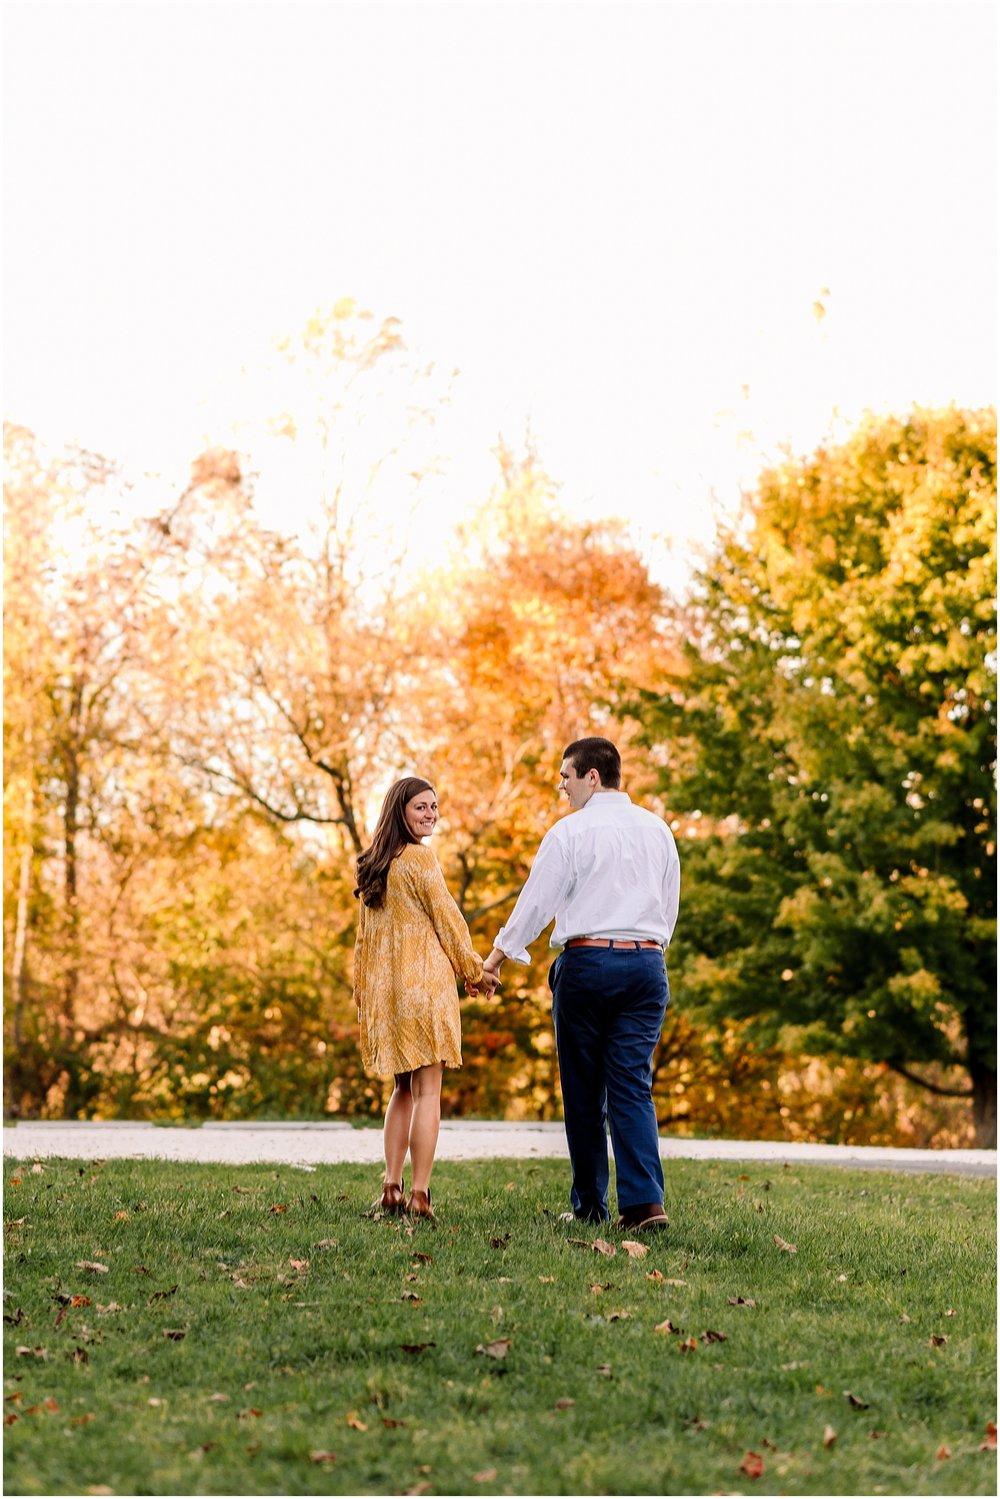 Hannah Leigh Photography Oregon Ridge Park Engagement Session_6430.jpg